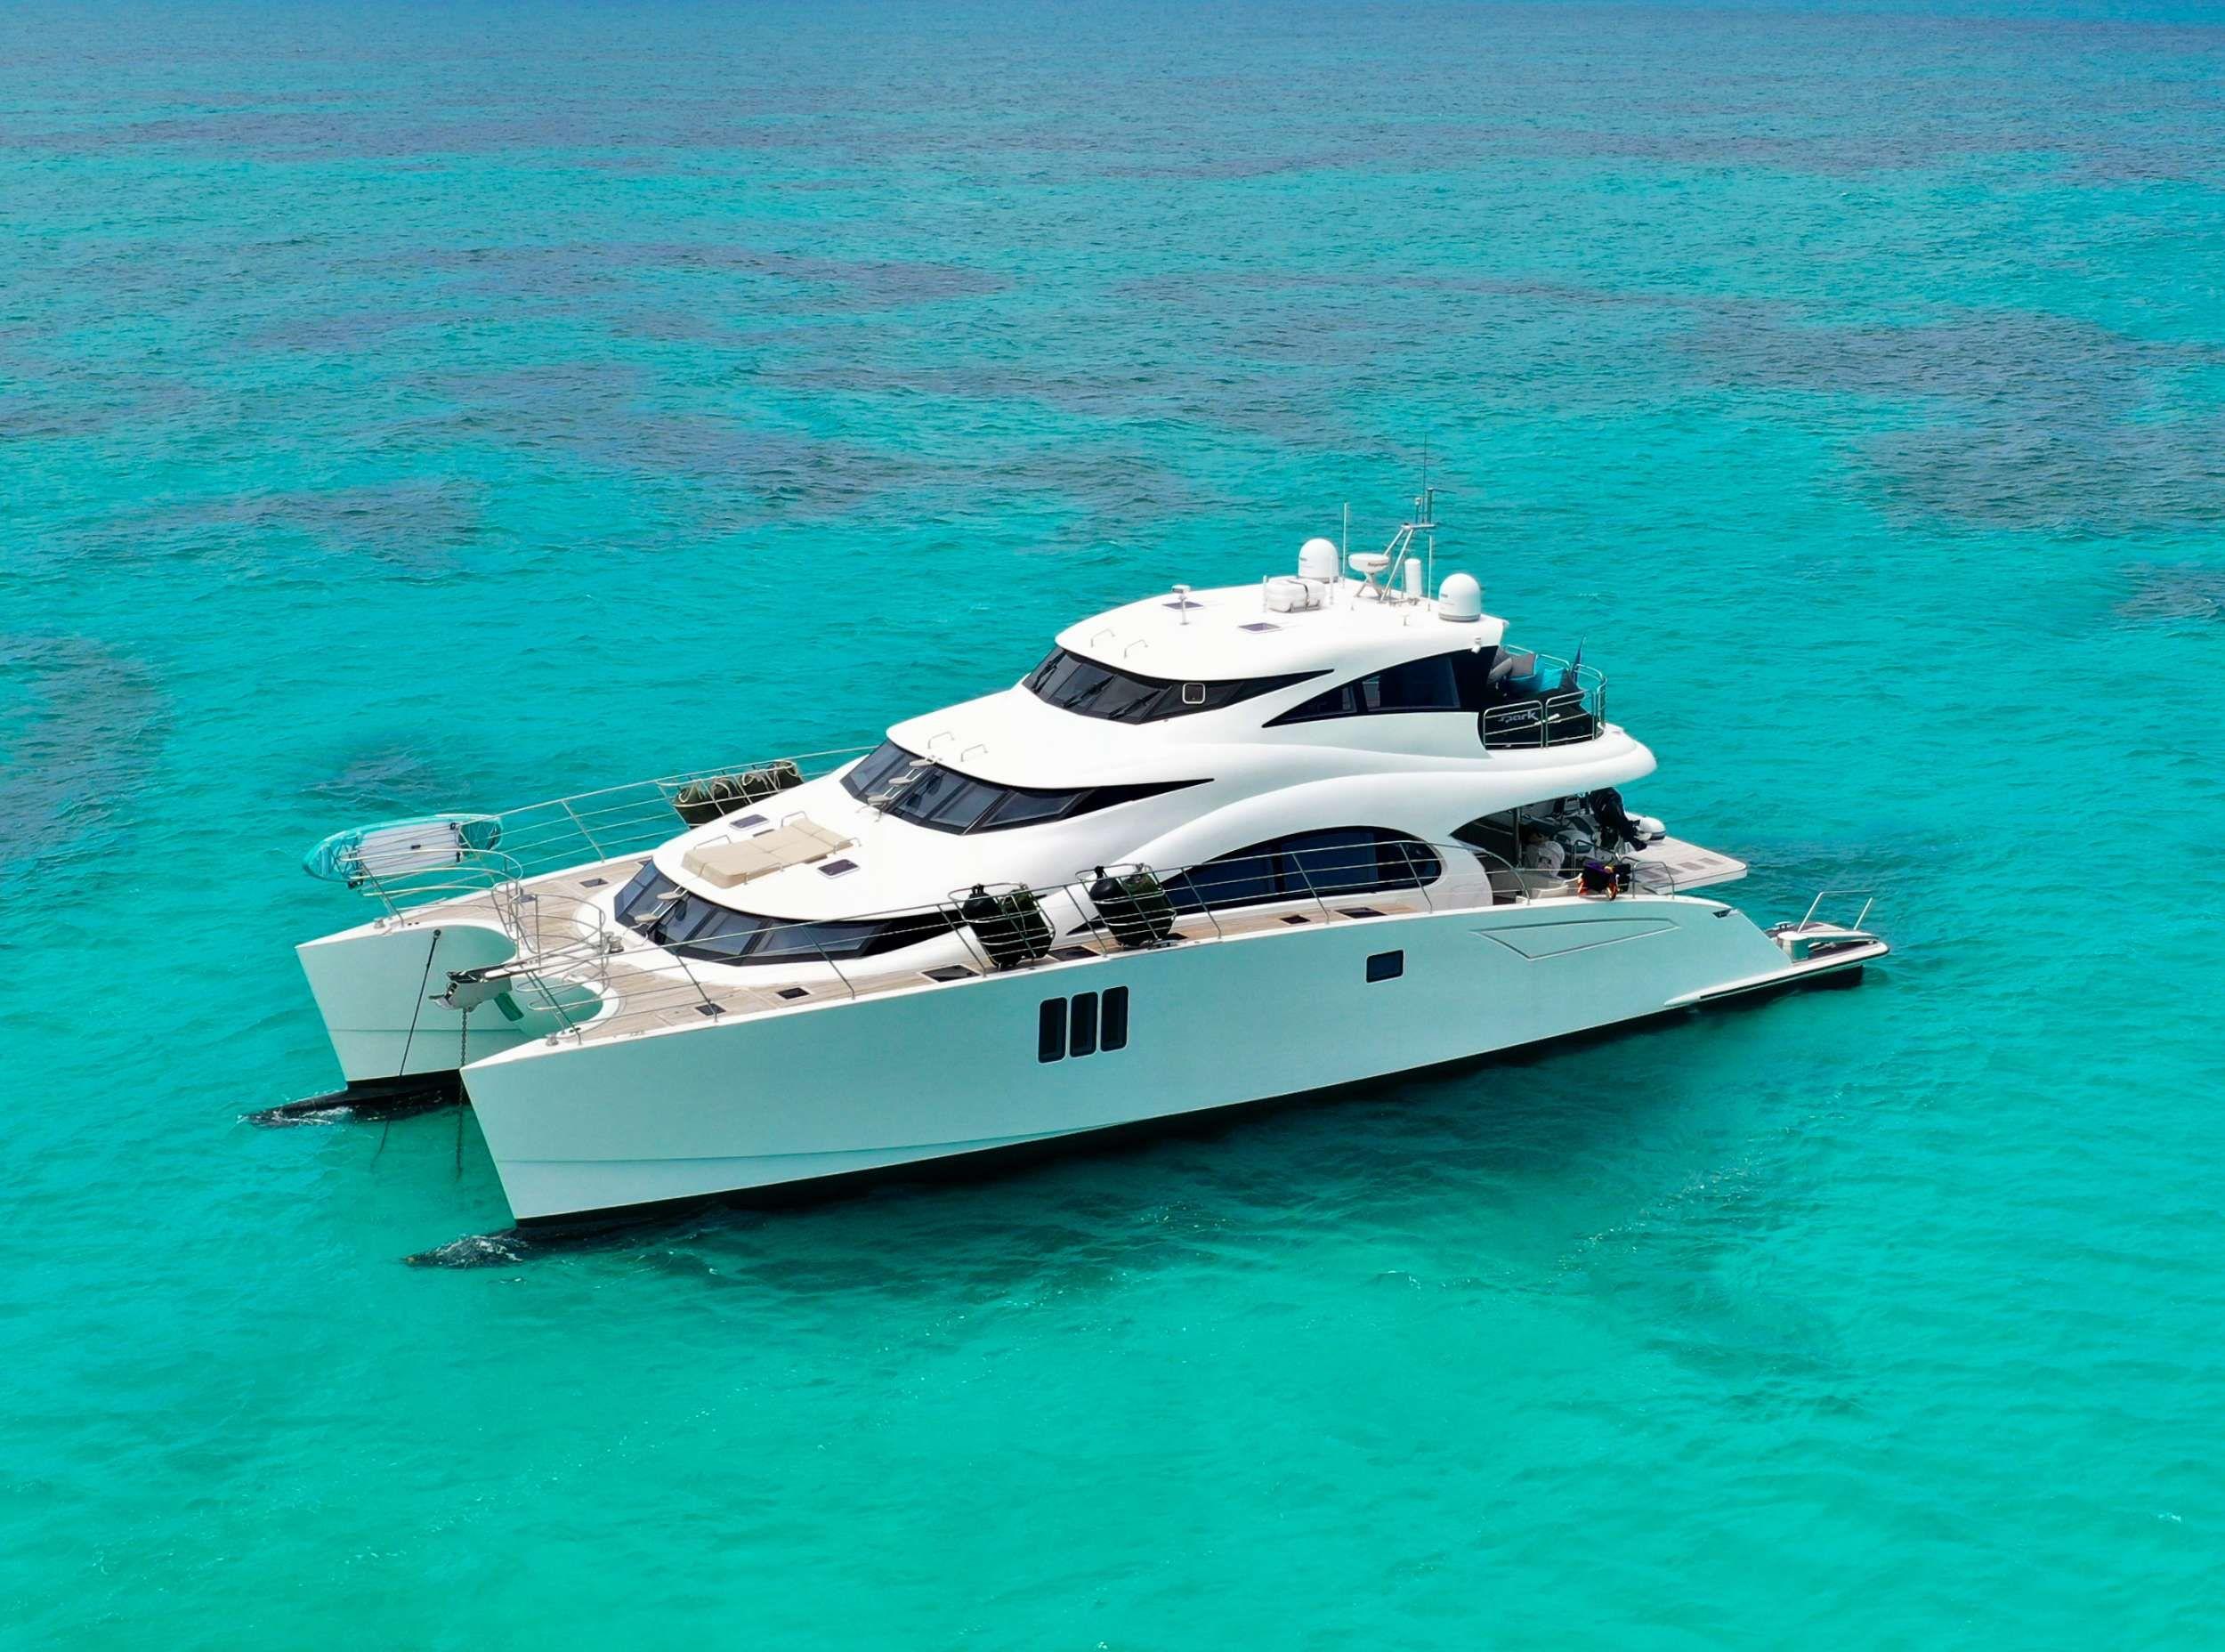 VALHALLA - Sunreef 78 - 4 Cabins - St Thomas - St John - Virgin Gorda - Anegada - Virgin Islands